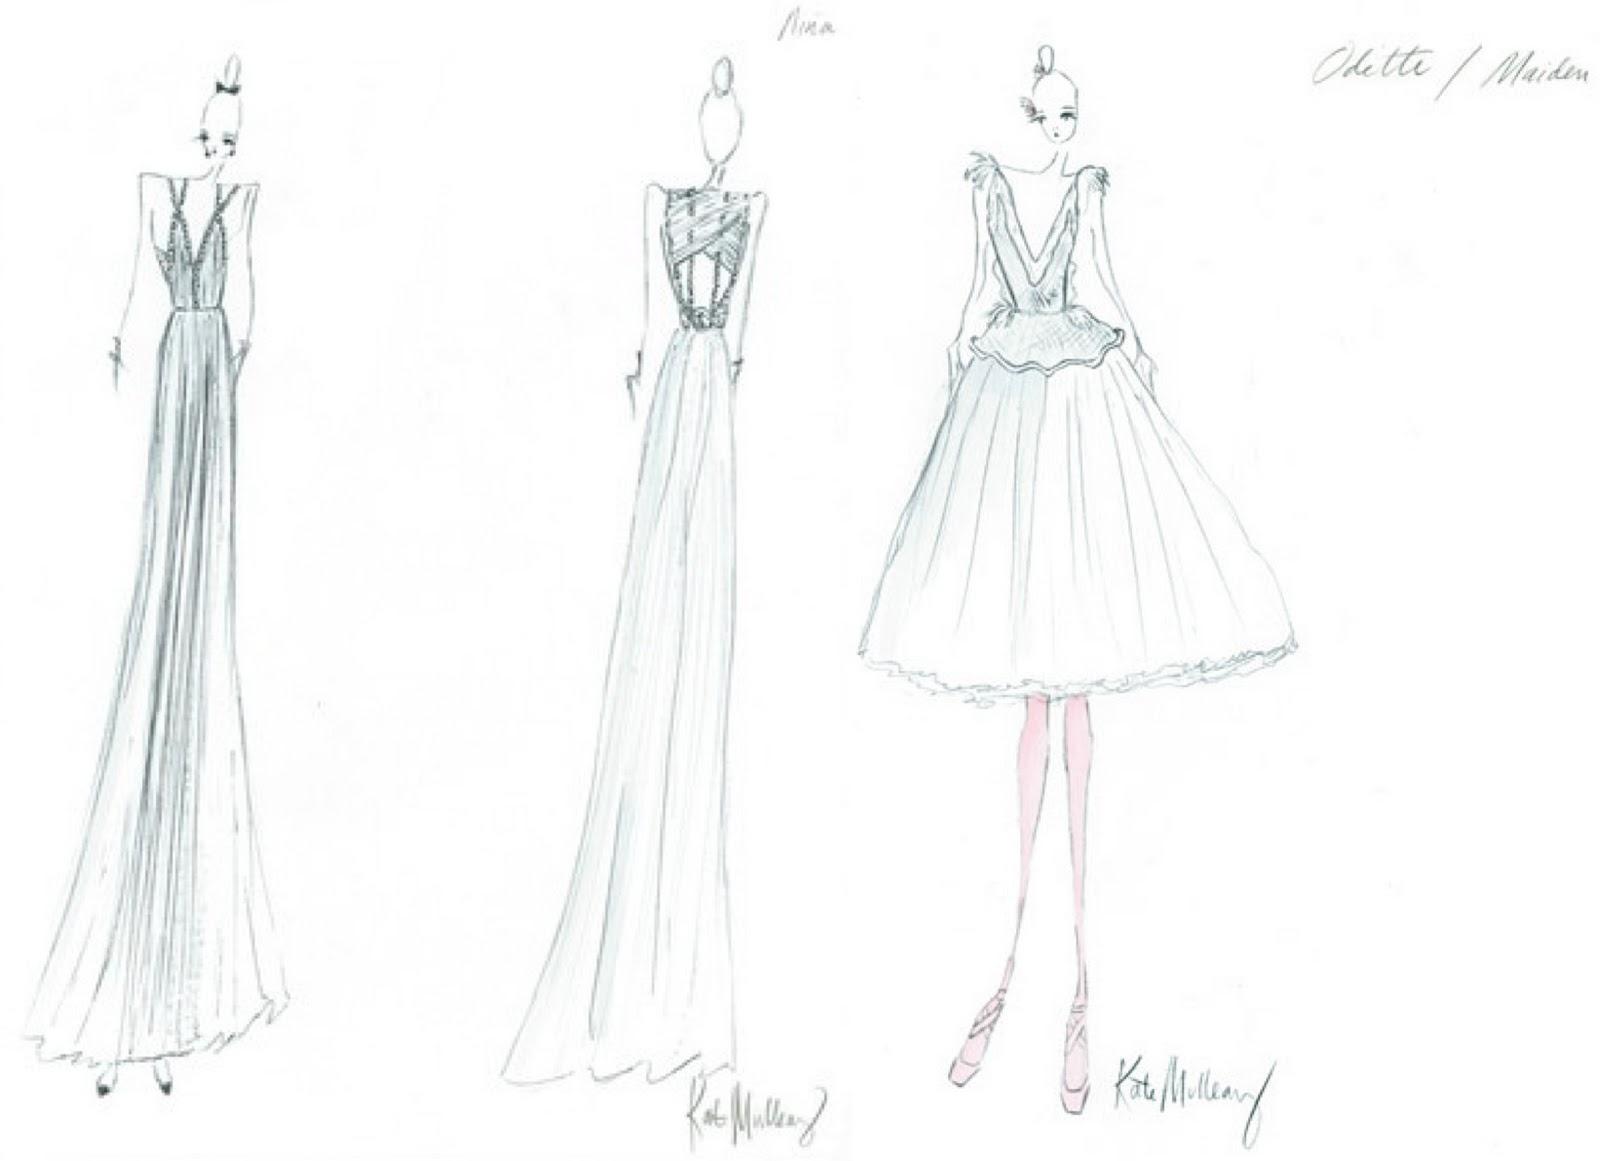 http://2.bp.blogspot.com/_PfmV3qvy8FY/TTPHr_mXqOI/AAAAAAAABAQ/dhUyXdH_6AQ/s1600/black+swan+sketches+2.jpg